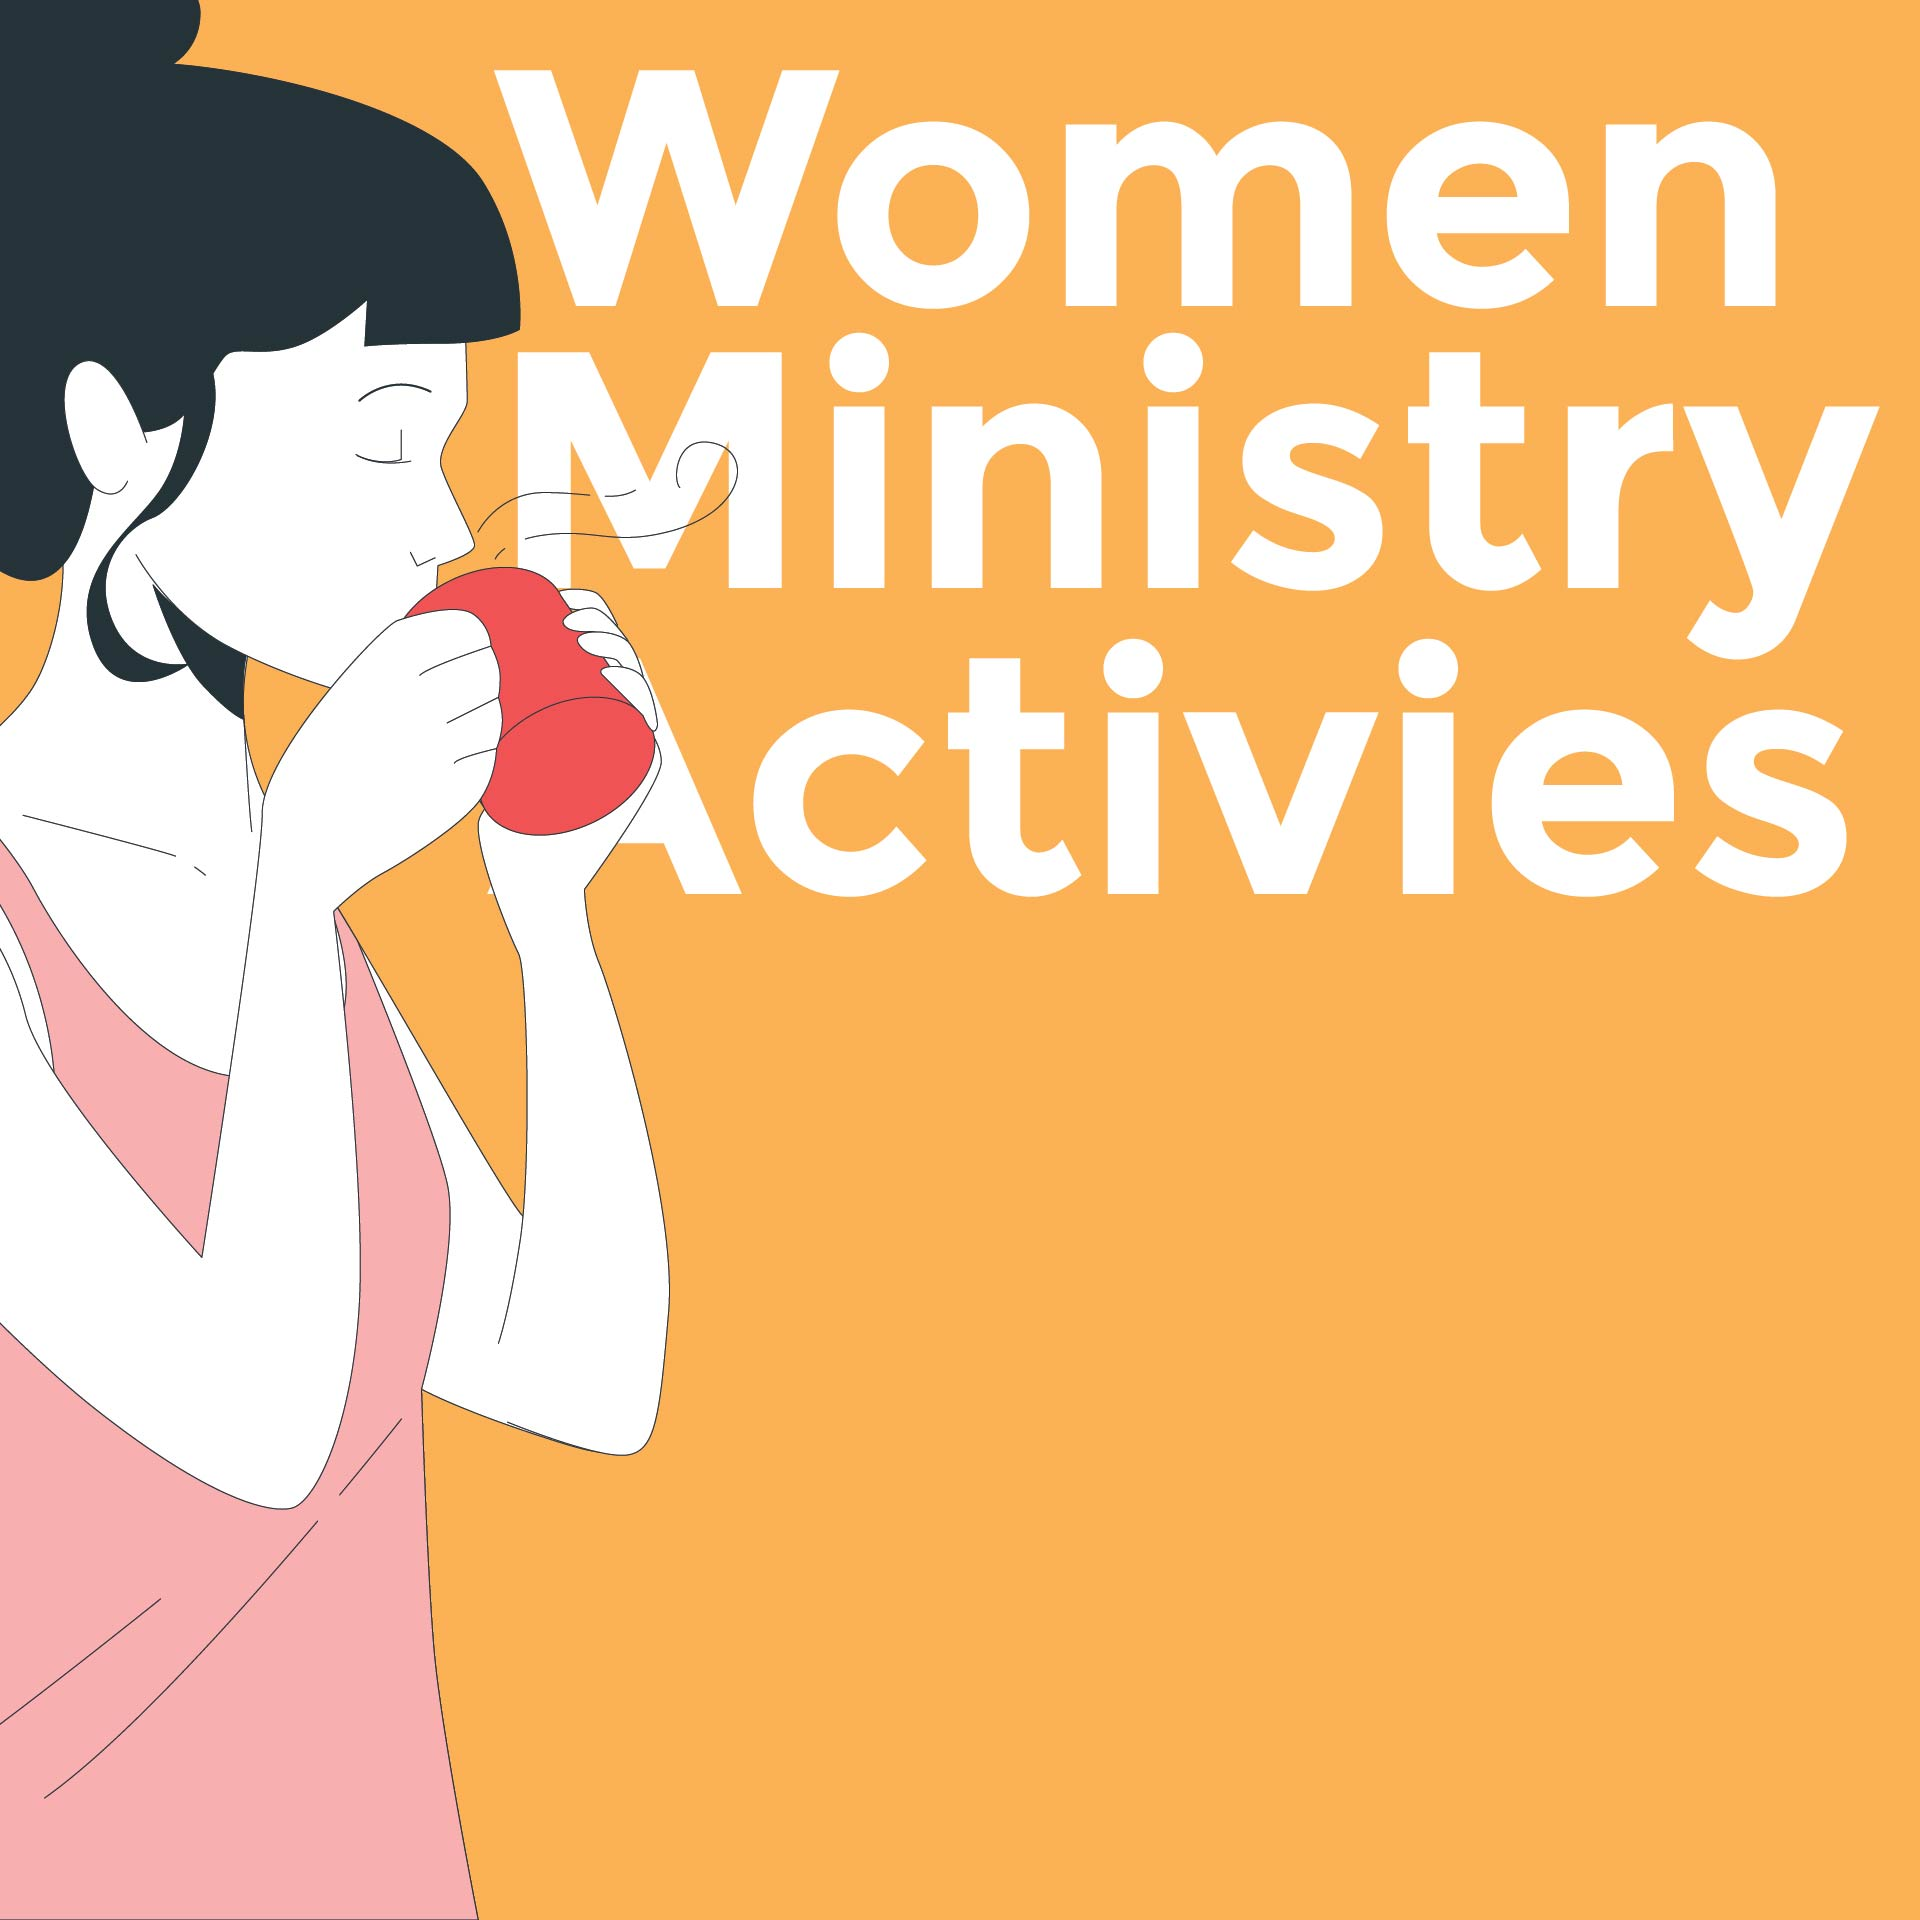 Women Ministry Activities Ideas